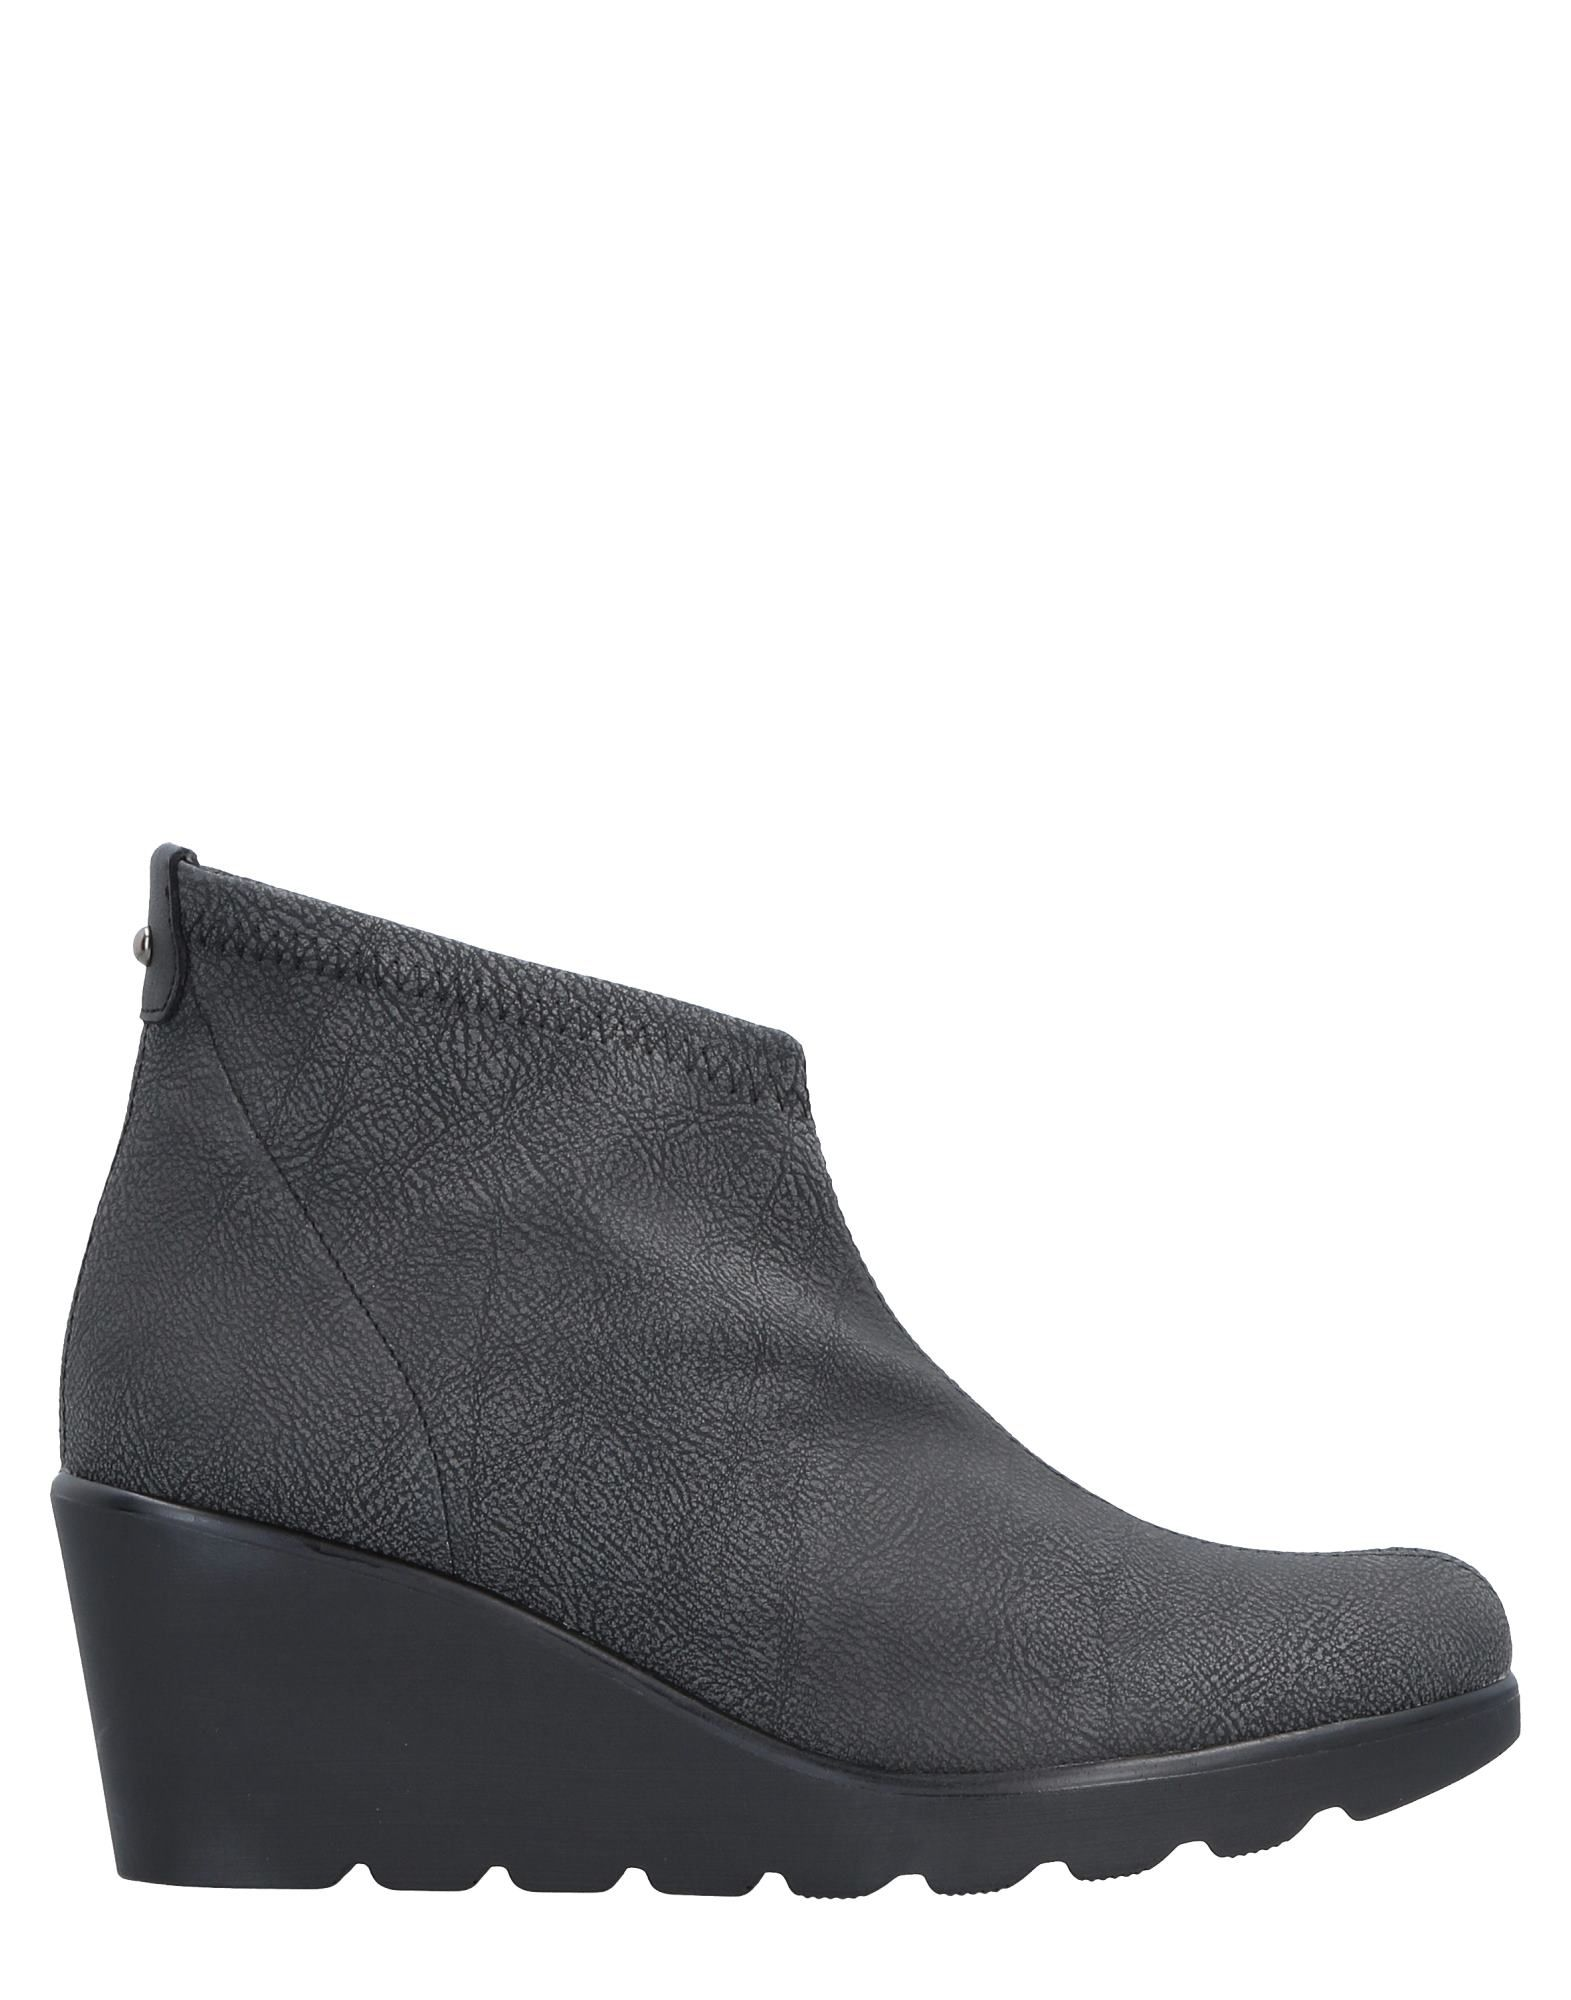 Toni Pons Stiefelette Damen  11517221WP Neue Schuhe